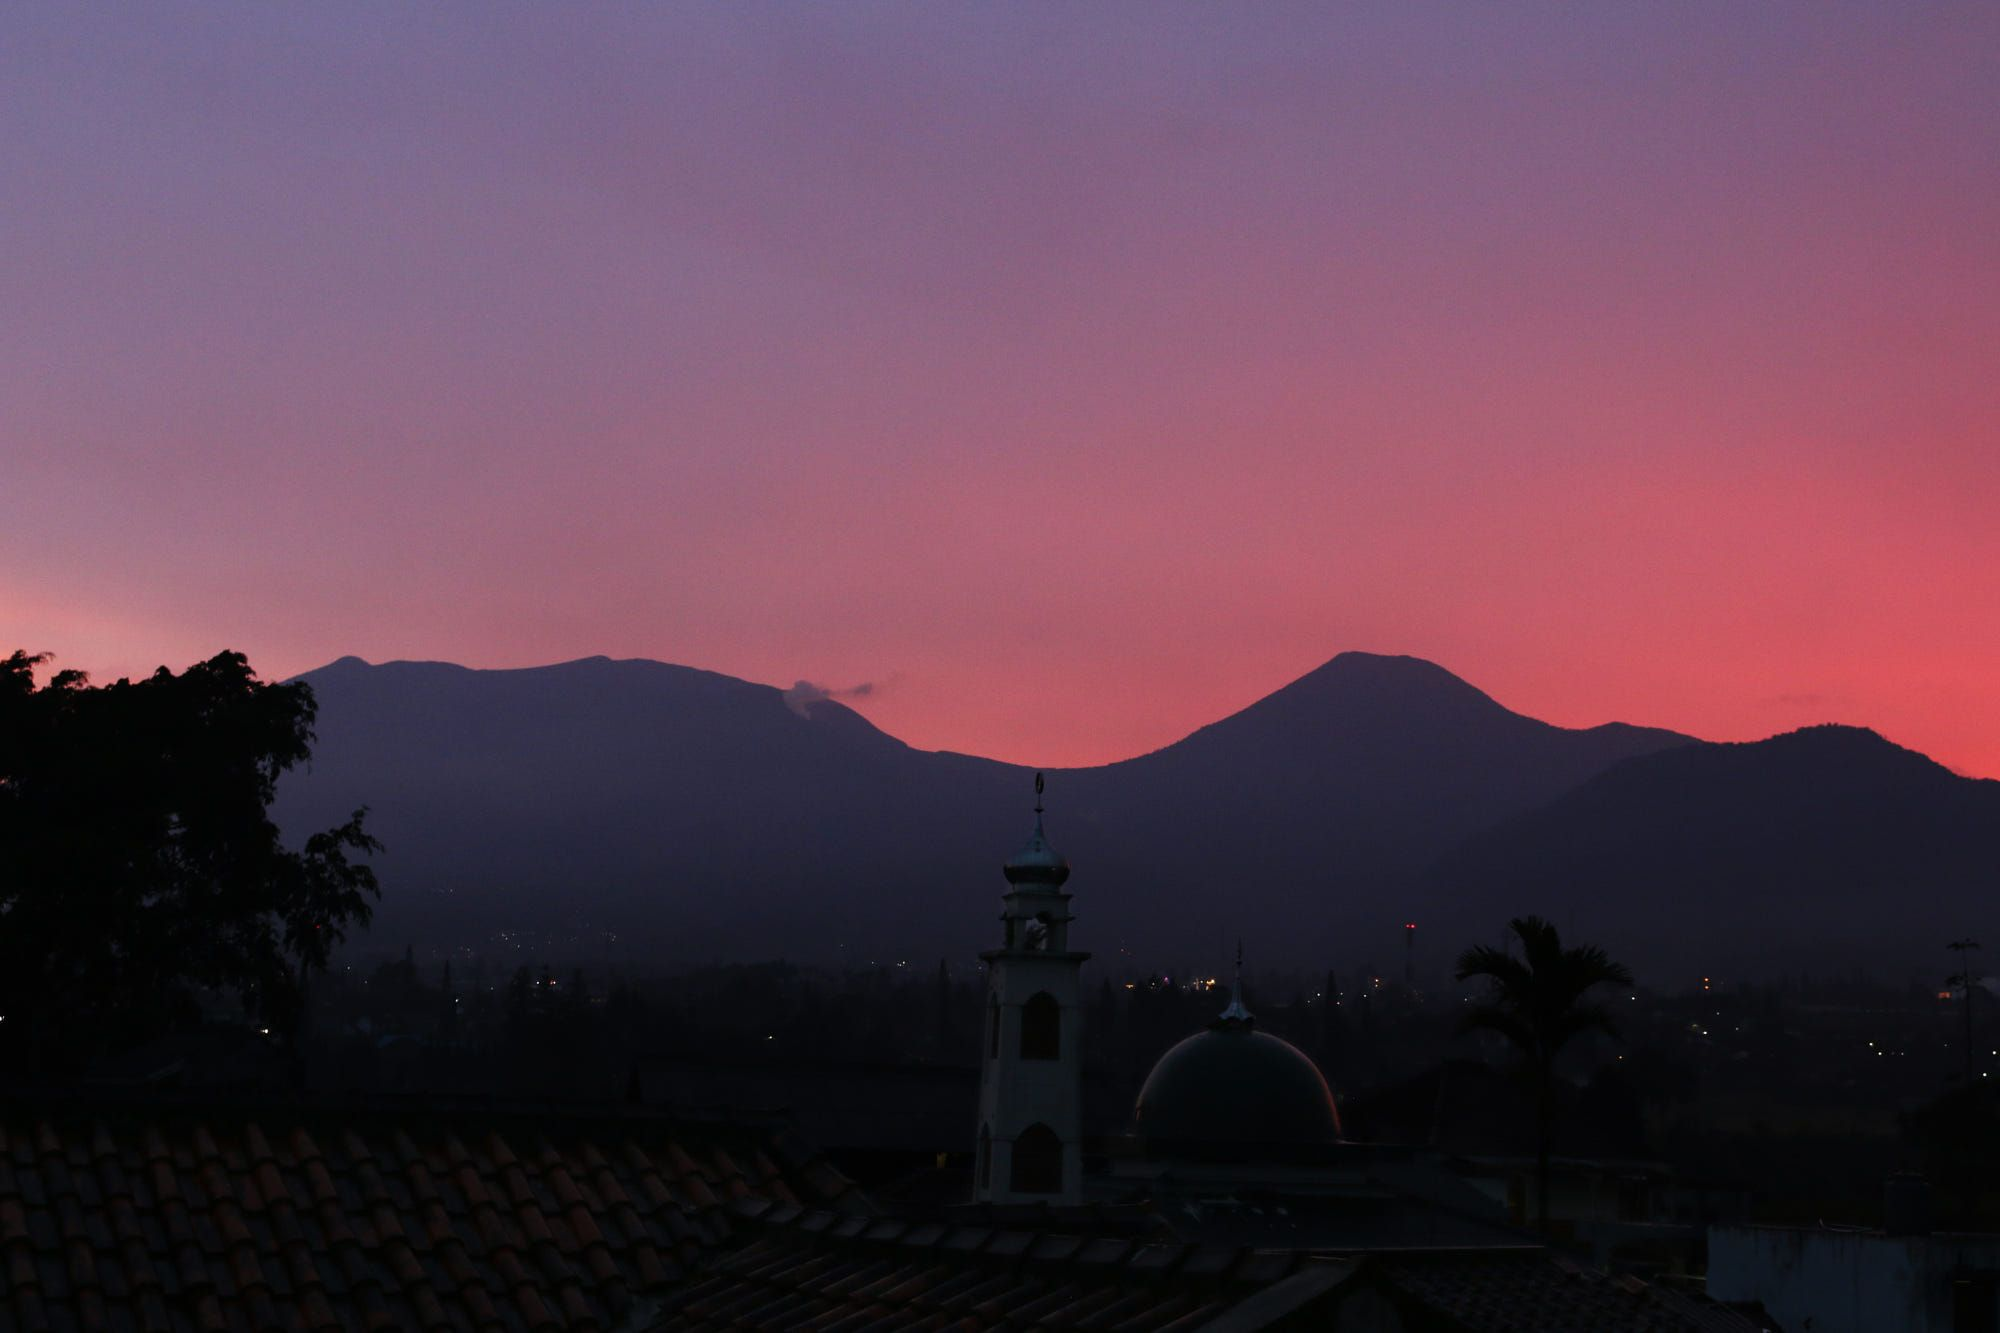 Mount Gede Pangrango Foto Alam Alam Firdaus